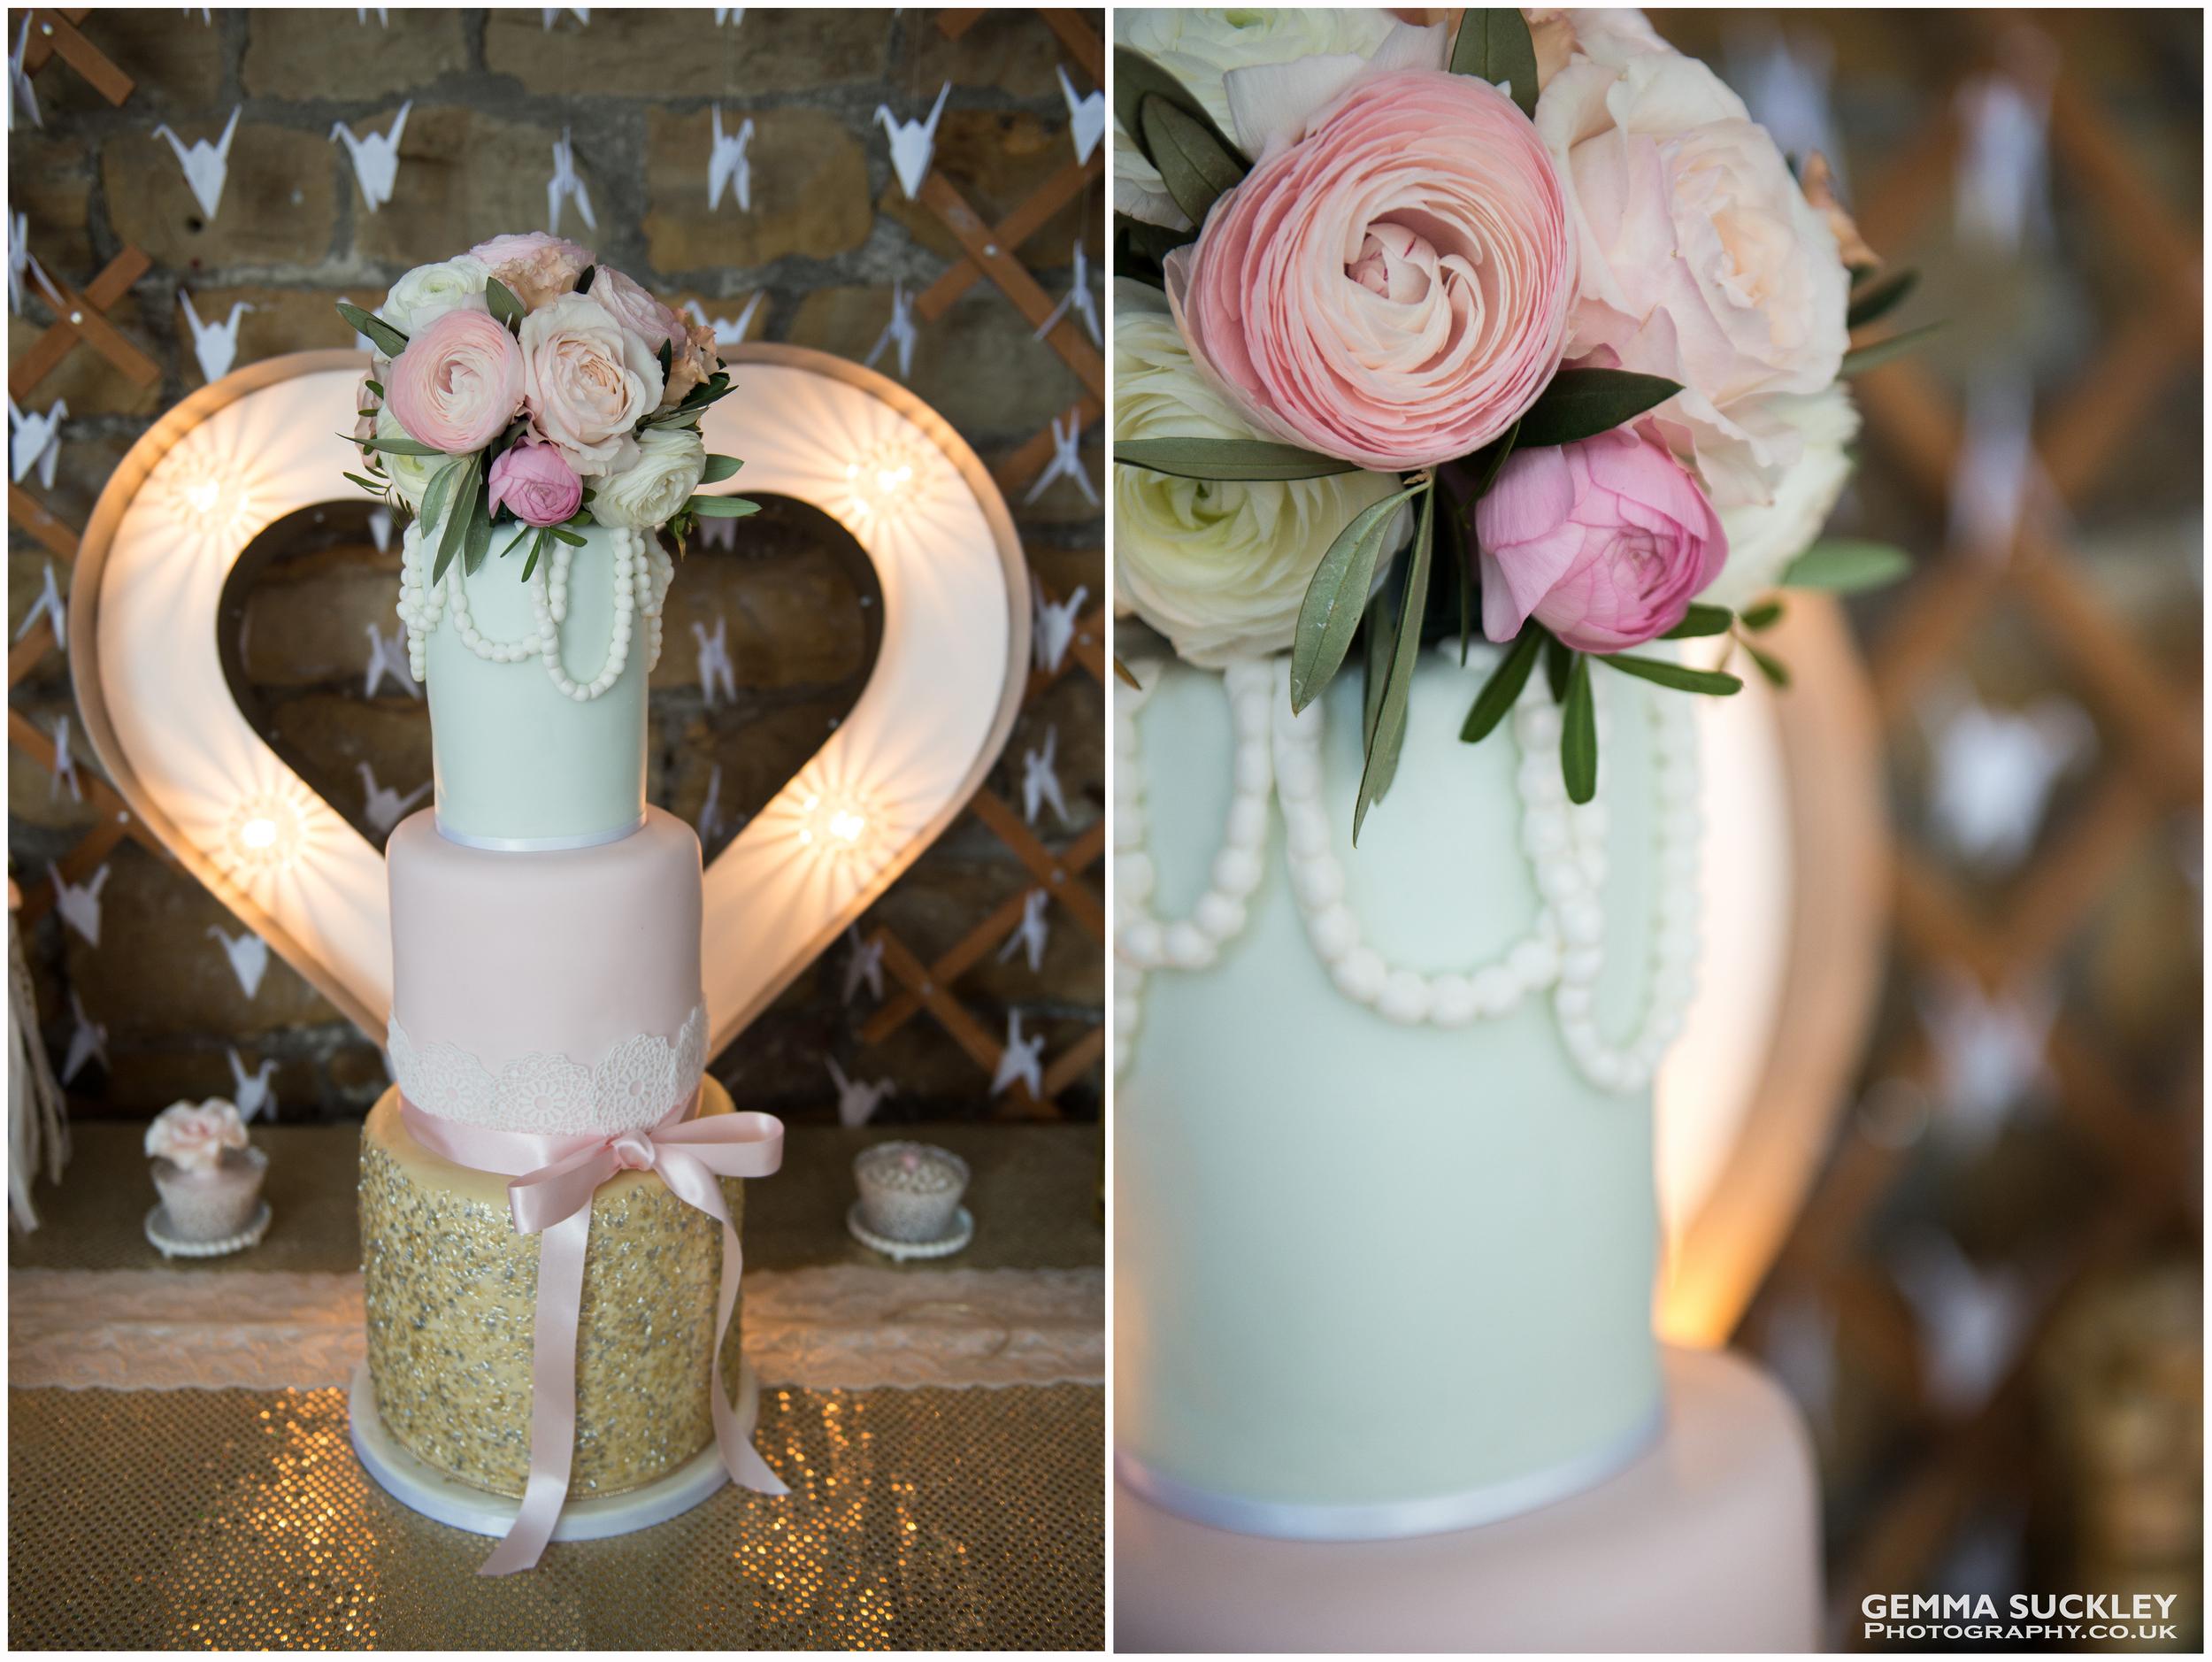 wedding-cake-oakwell-hall-gemma-suckley-photography.jpg